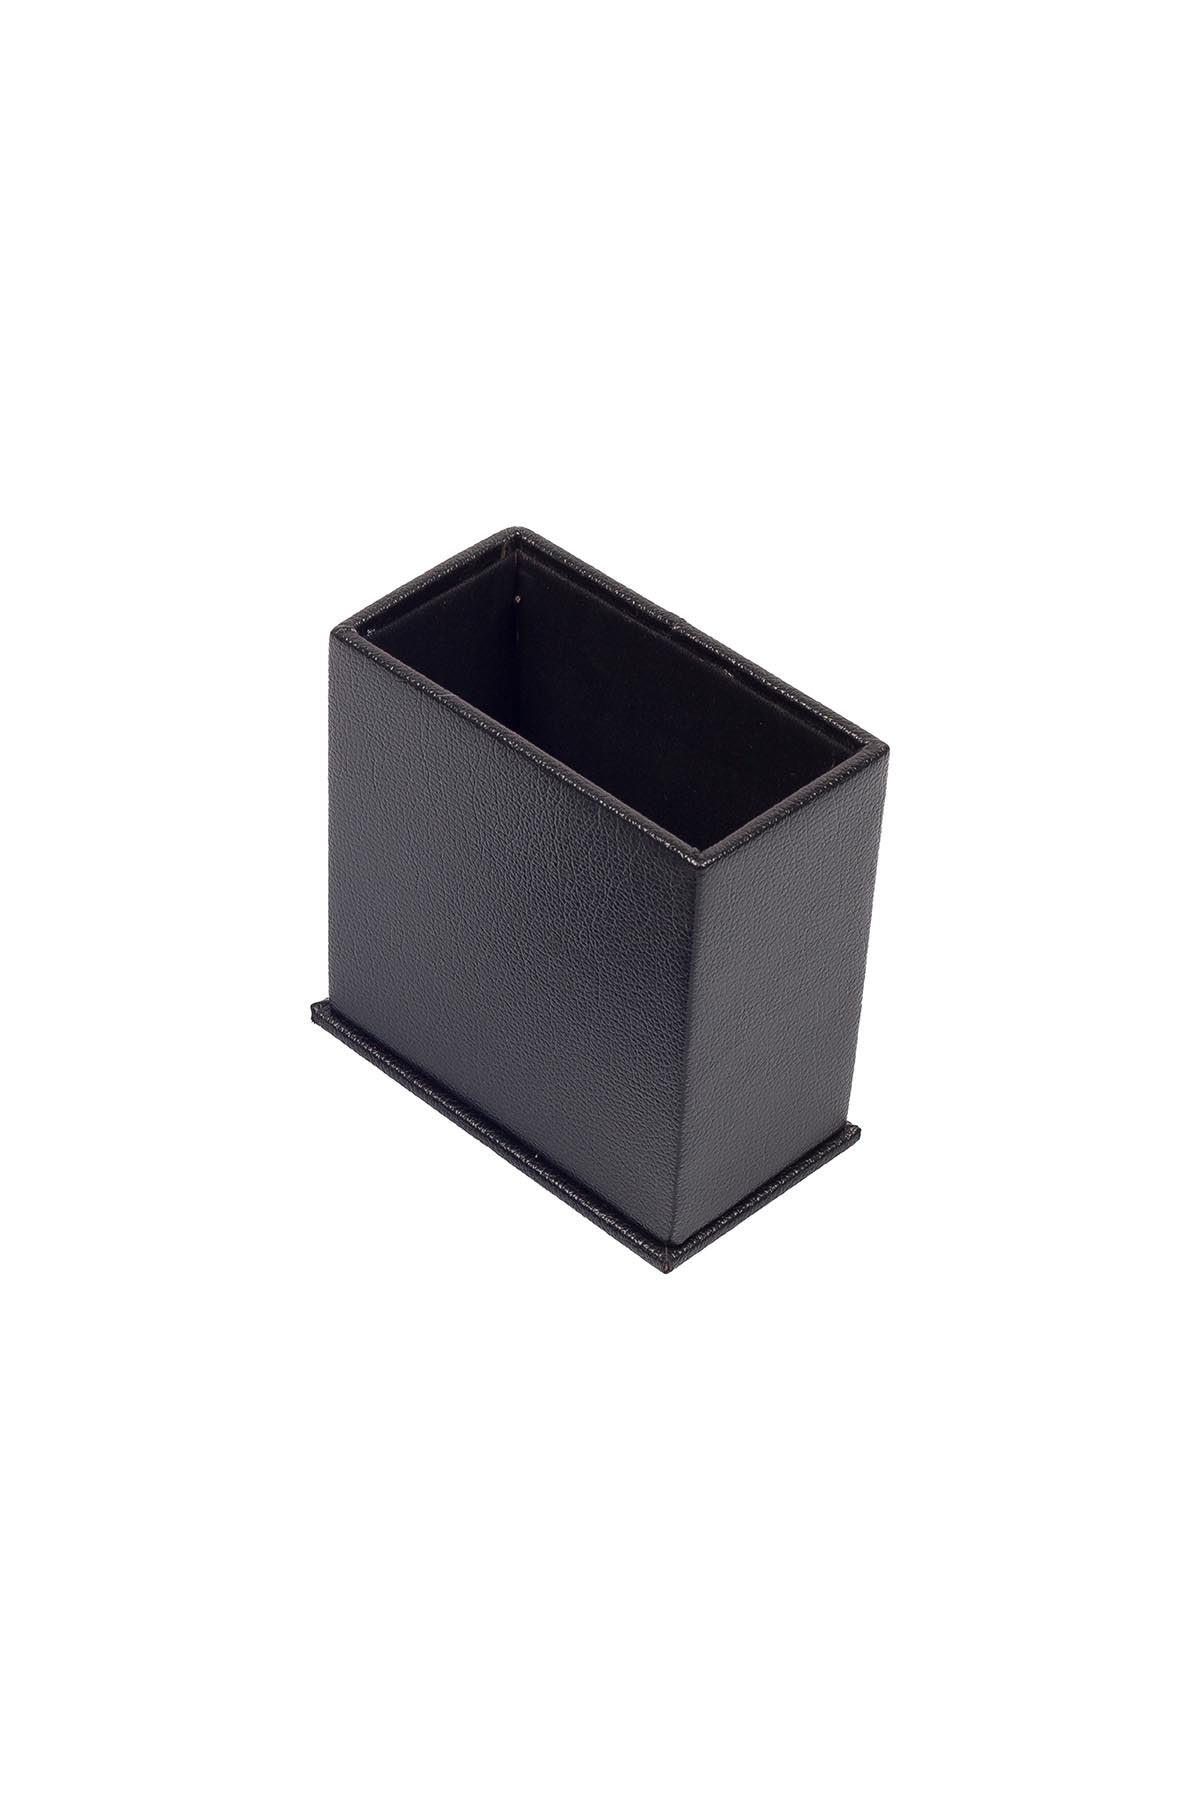 Leather Desk Set 8 Accessories Black